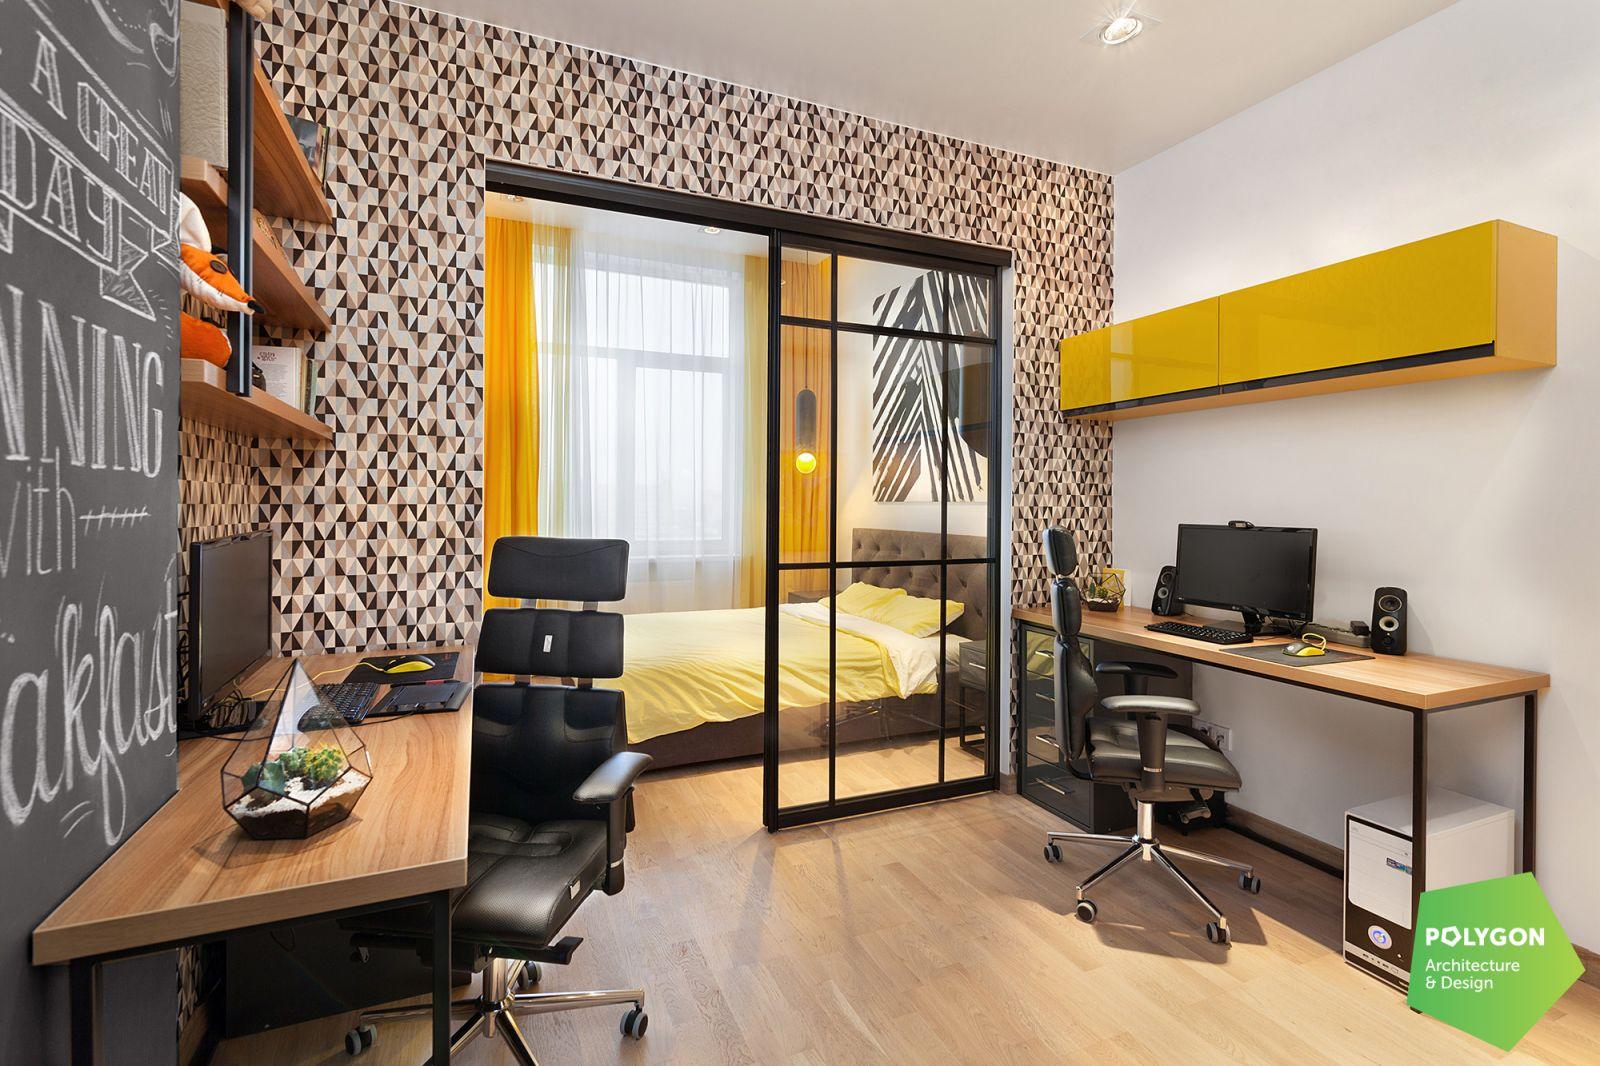 v kabineti Yellow flat